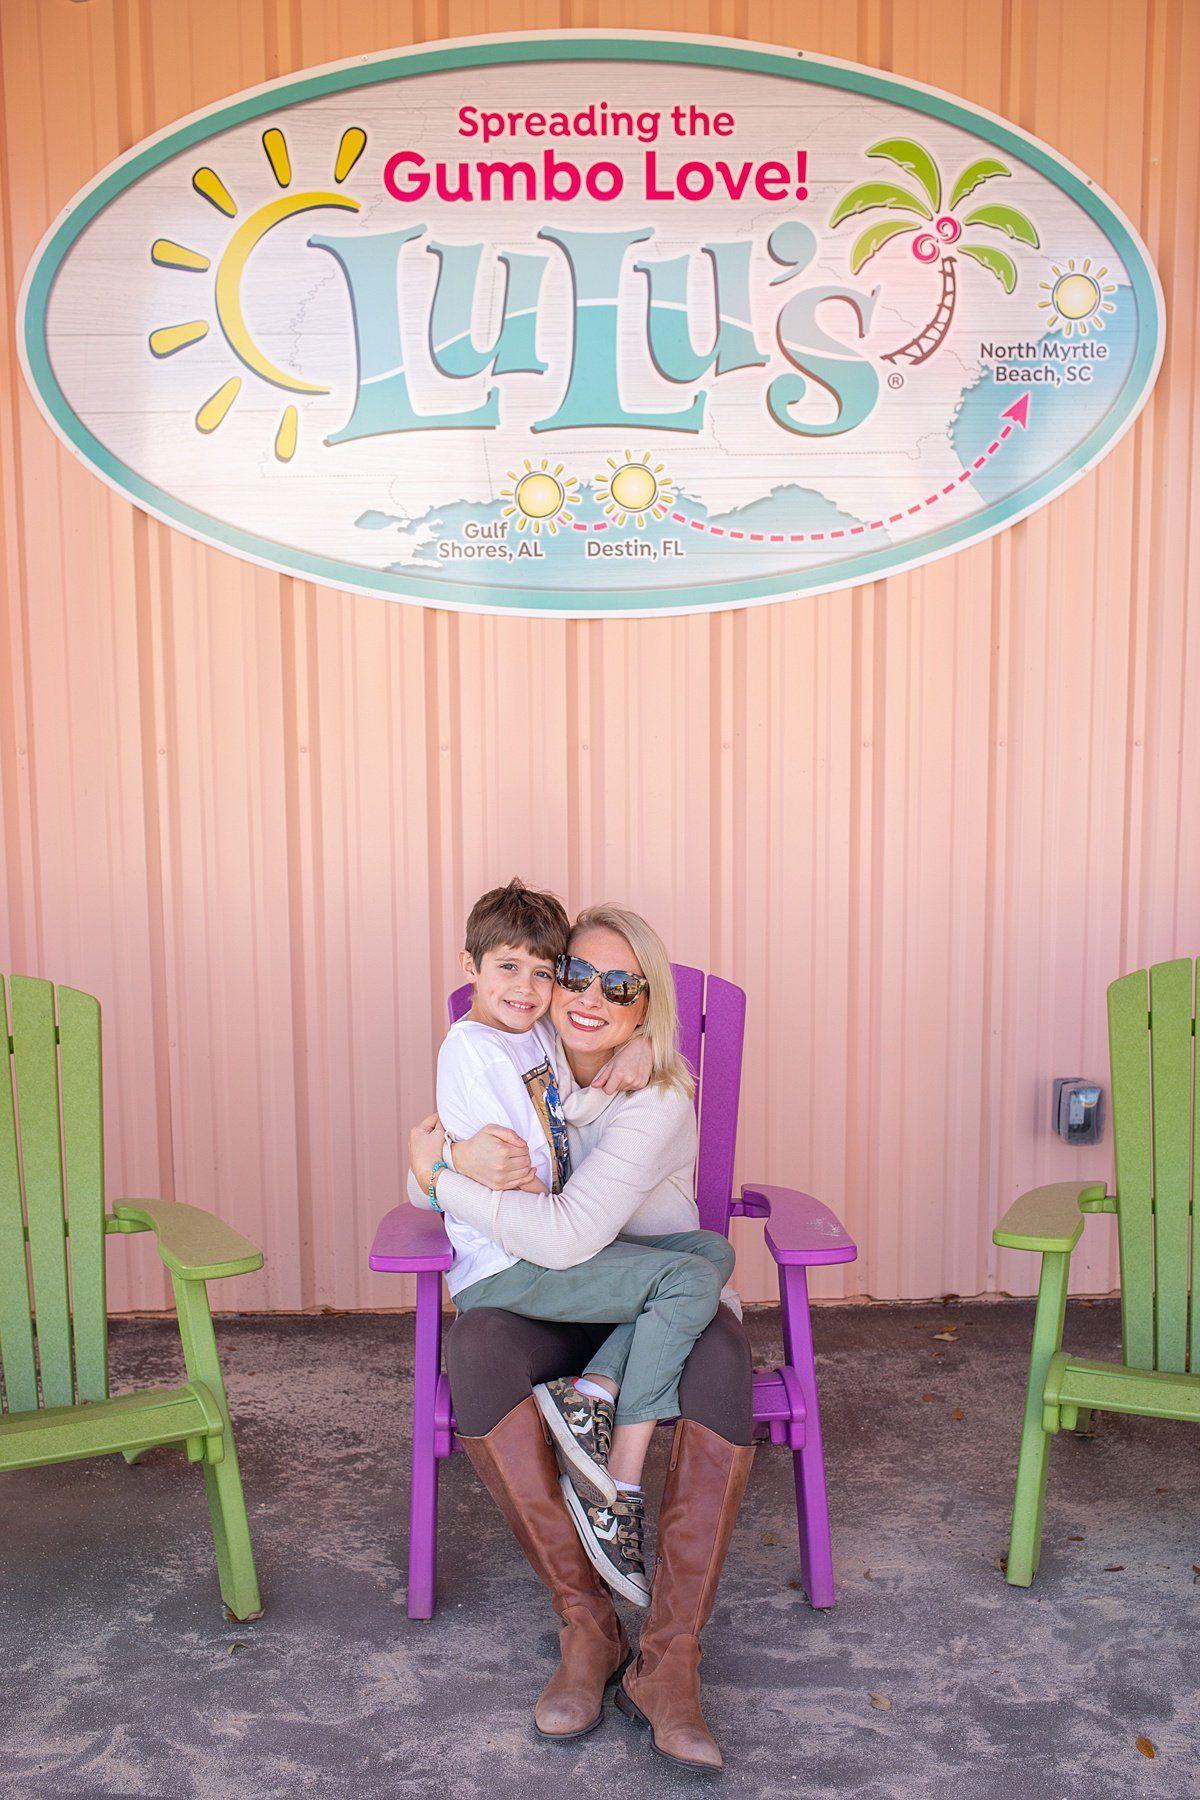 Myrtle Beach Family Weekend Travel Guide in 2020 Myrtle